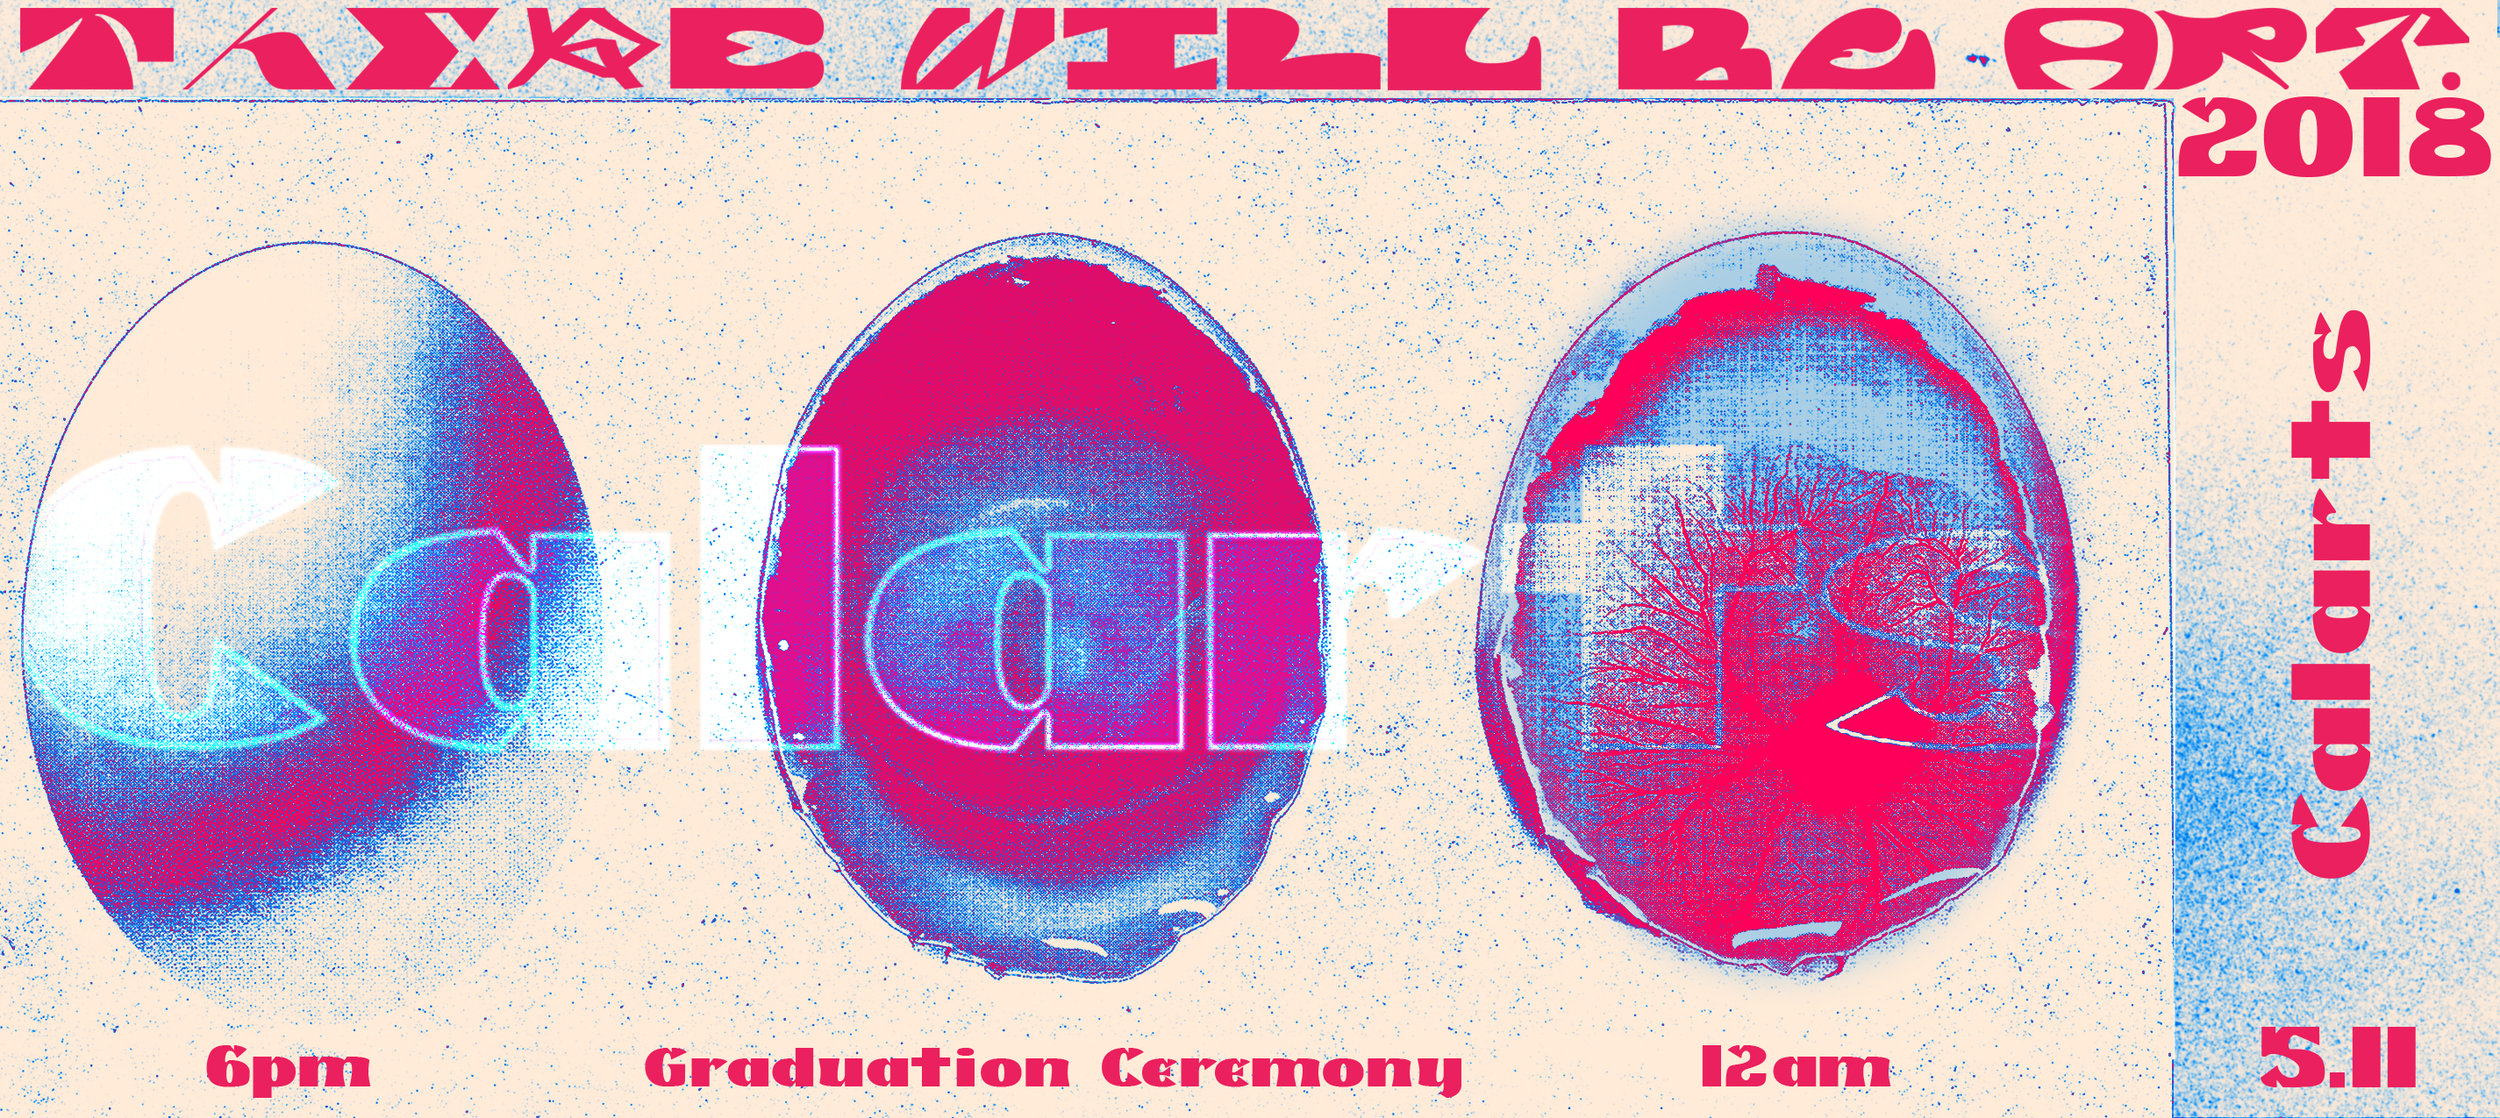 Graduation-physical-invite-front.jpg